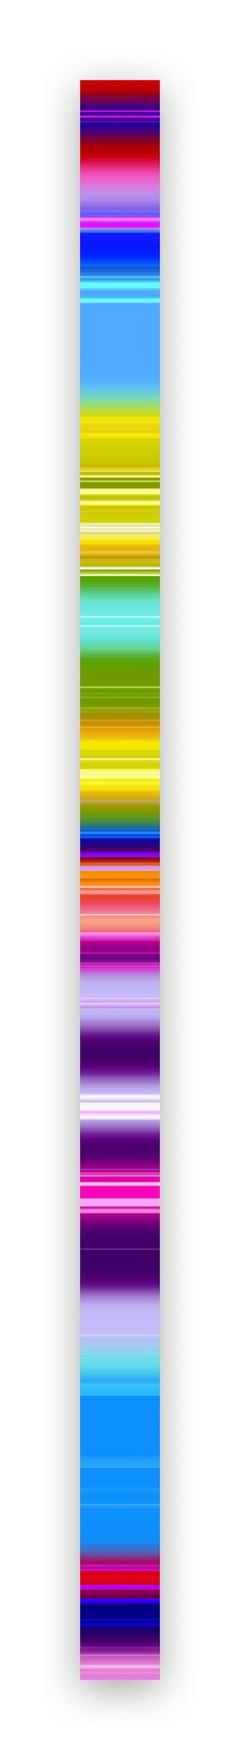 Lumina # 202103 (Abstract photography)